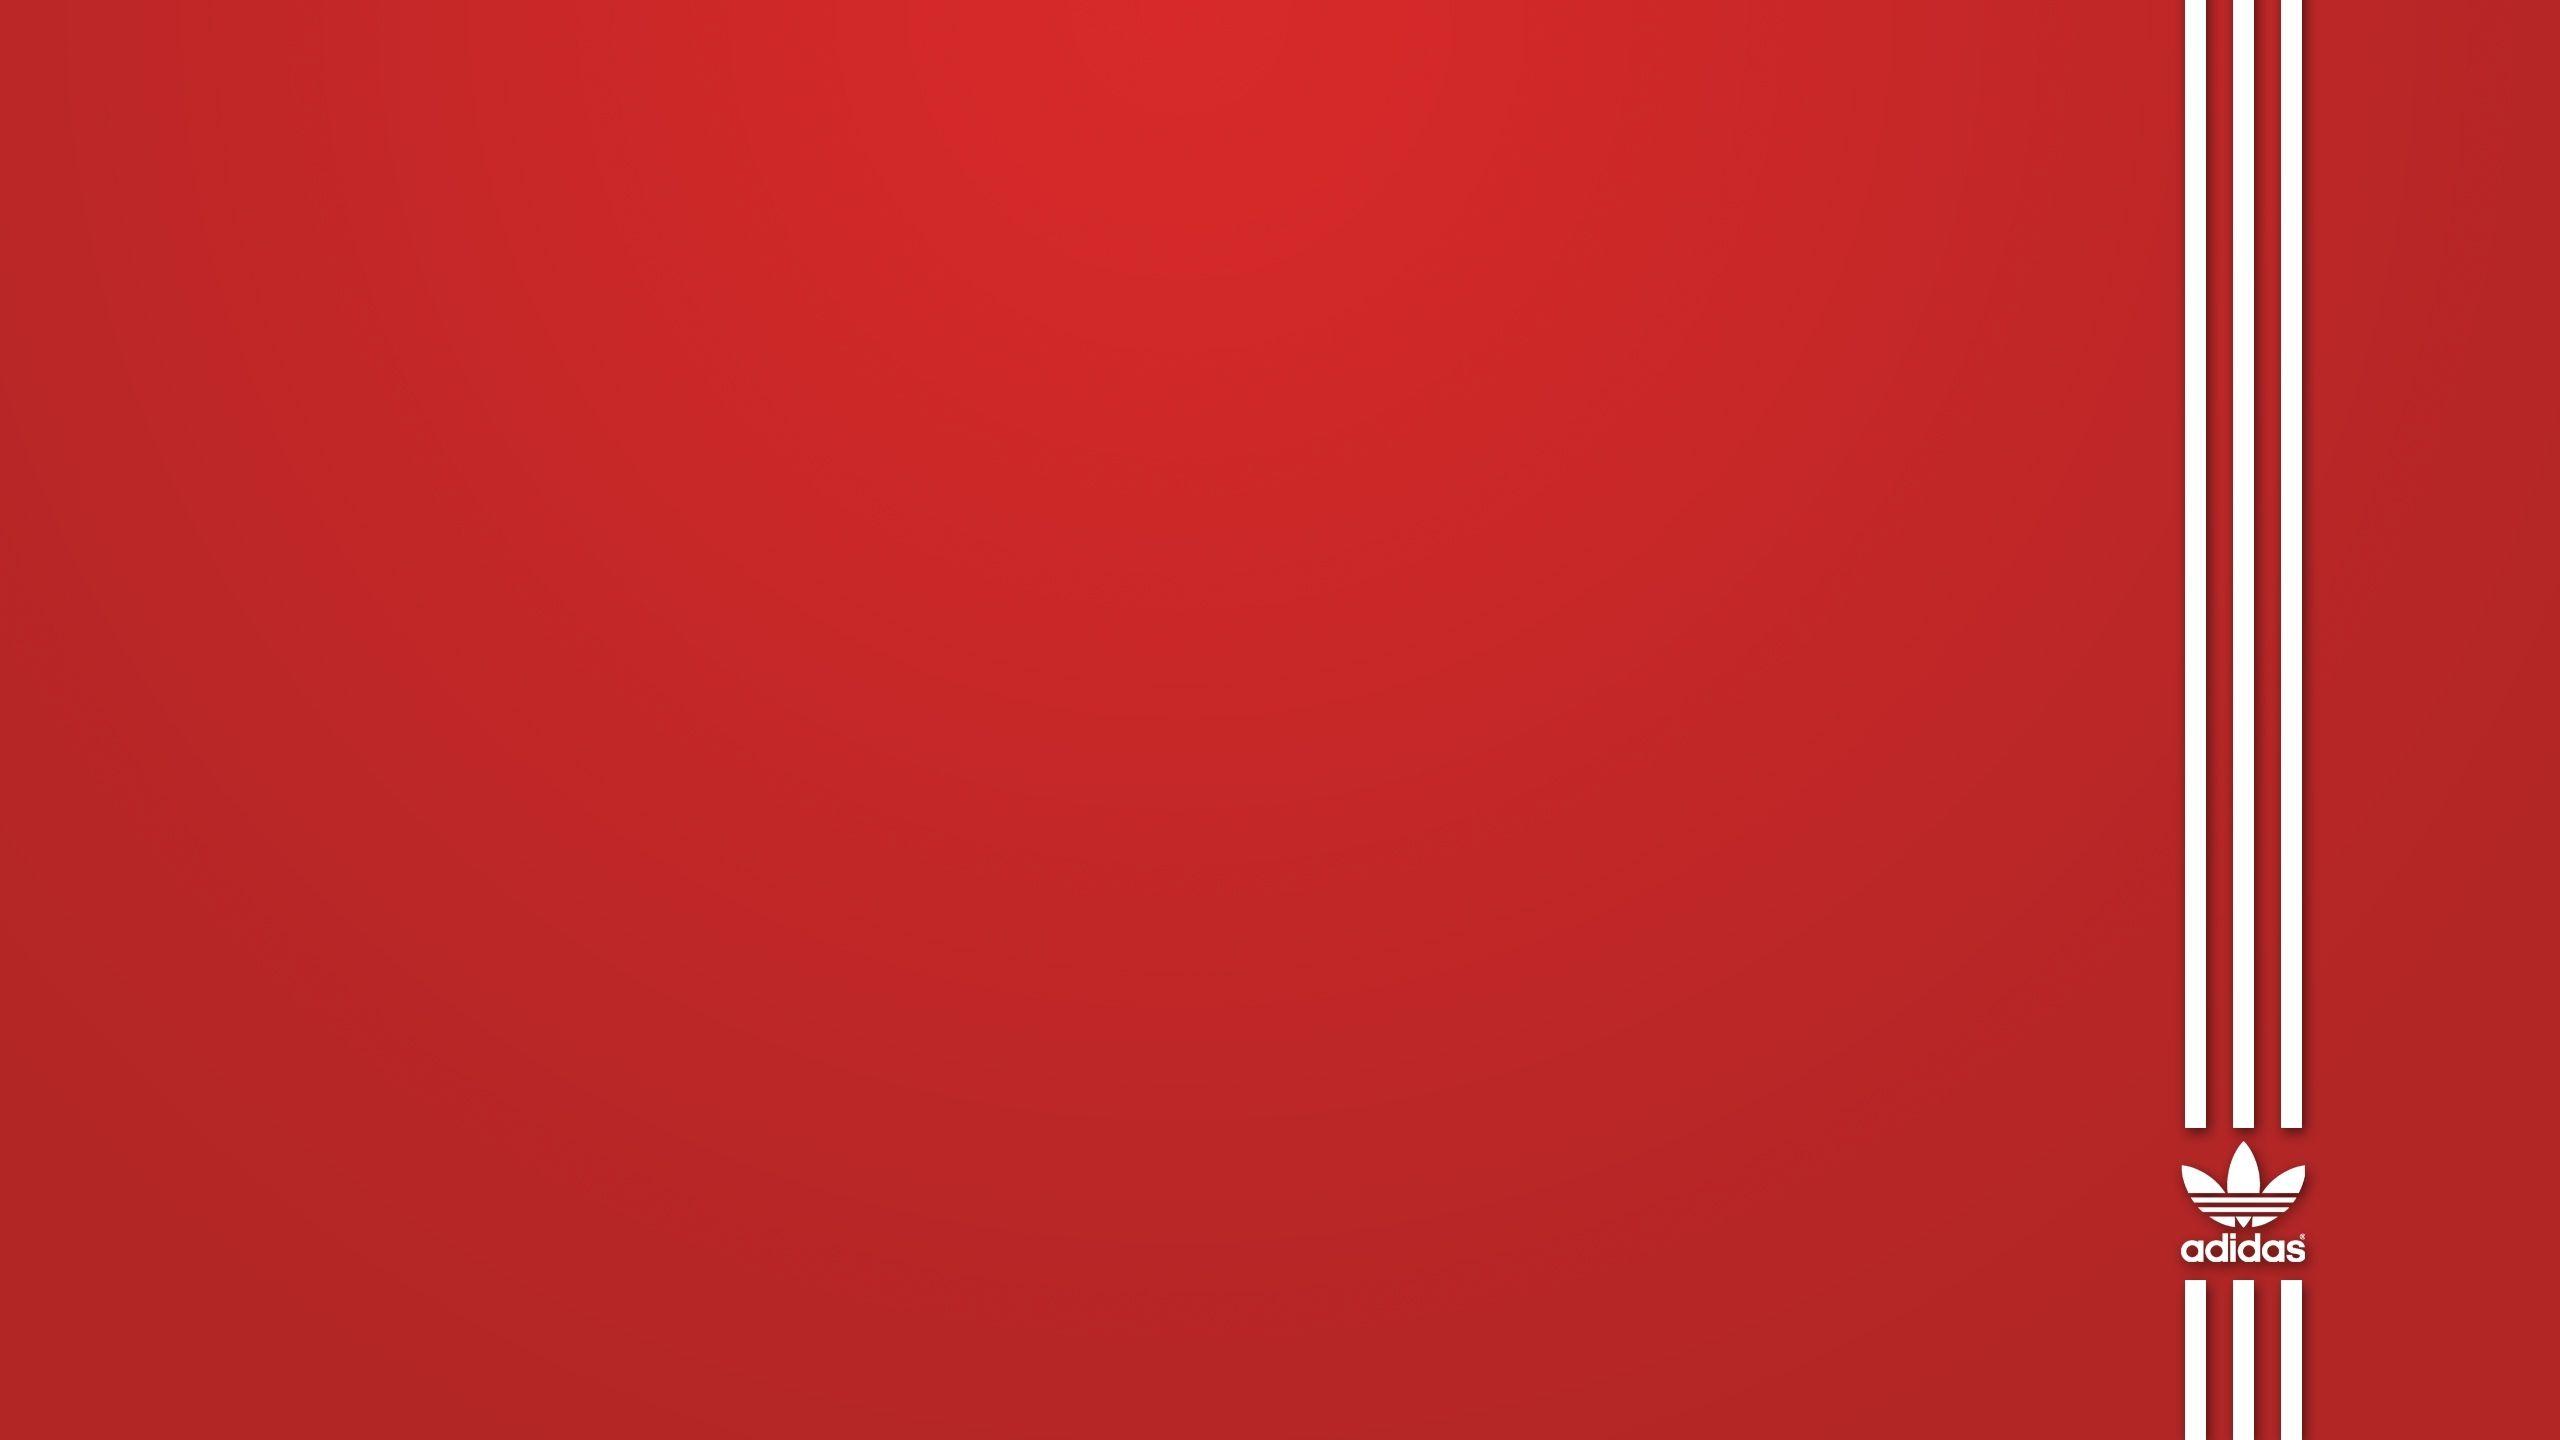 2560x1440 Adidas Red White 赤い壁紙, 壁紙, デスクトップ